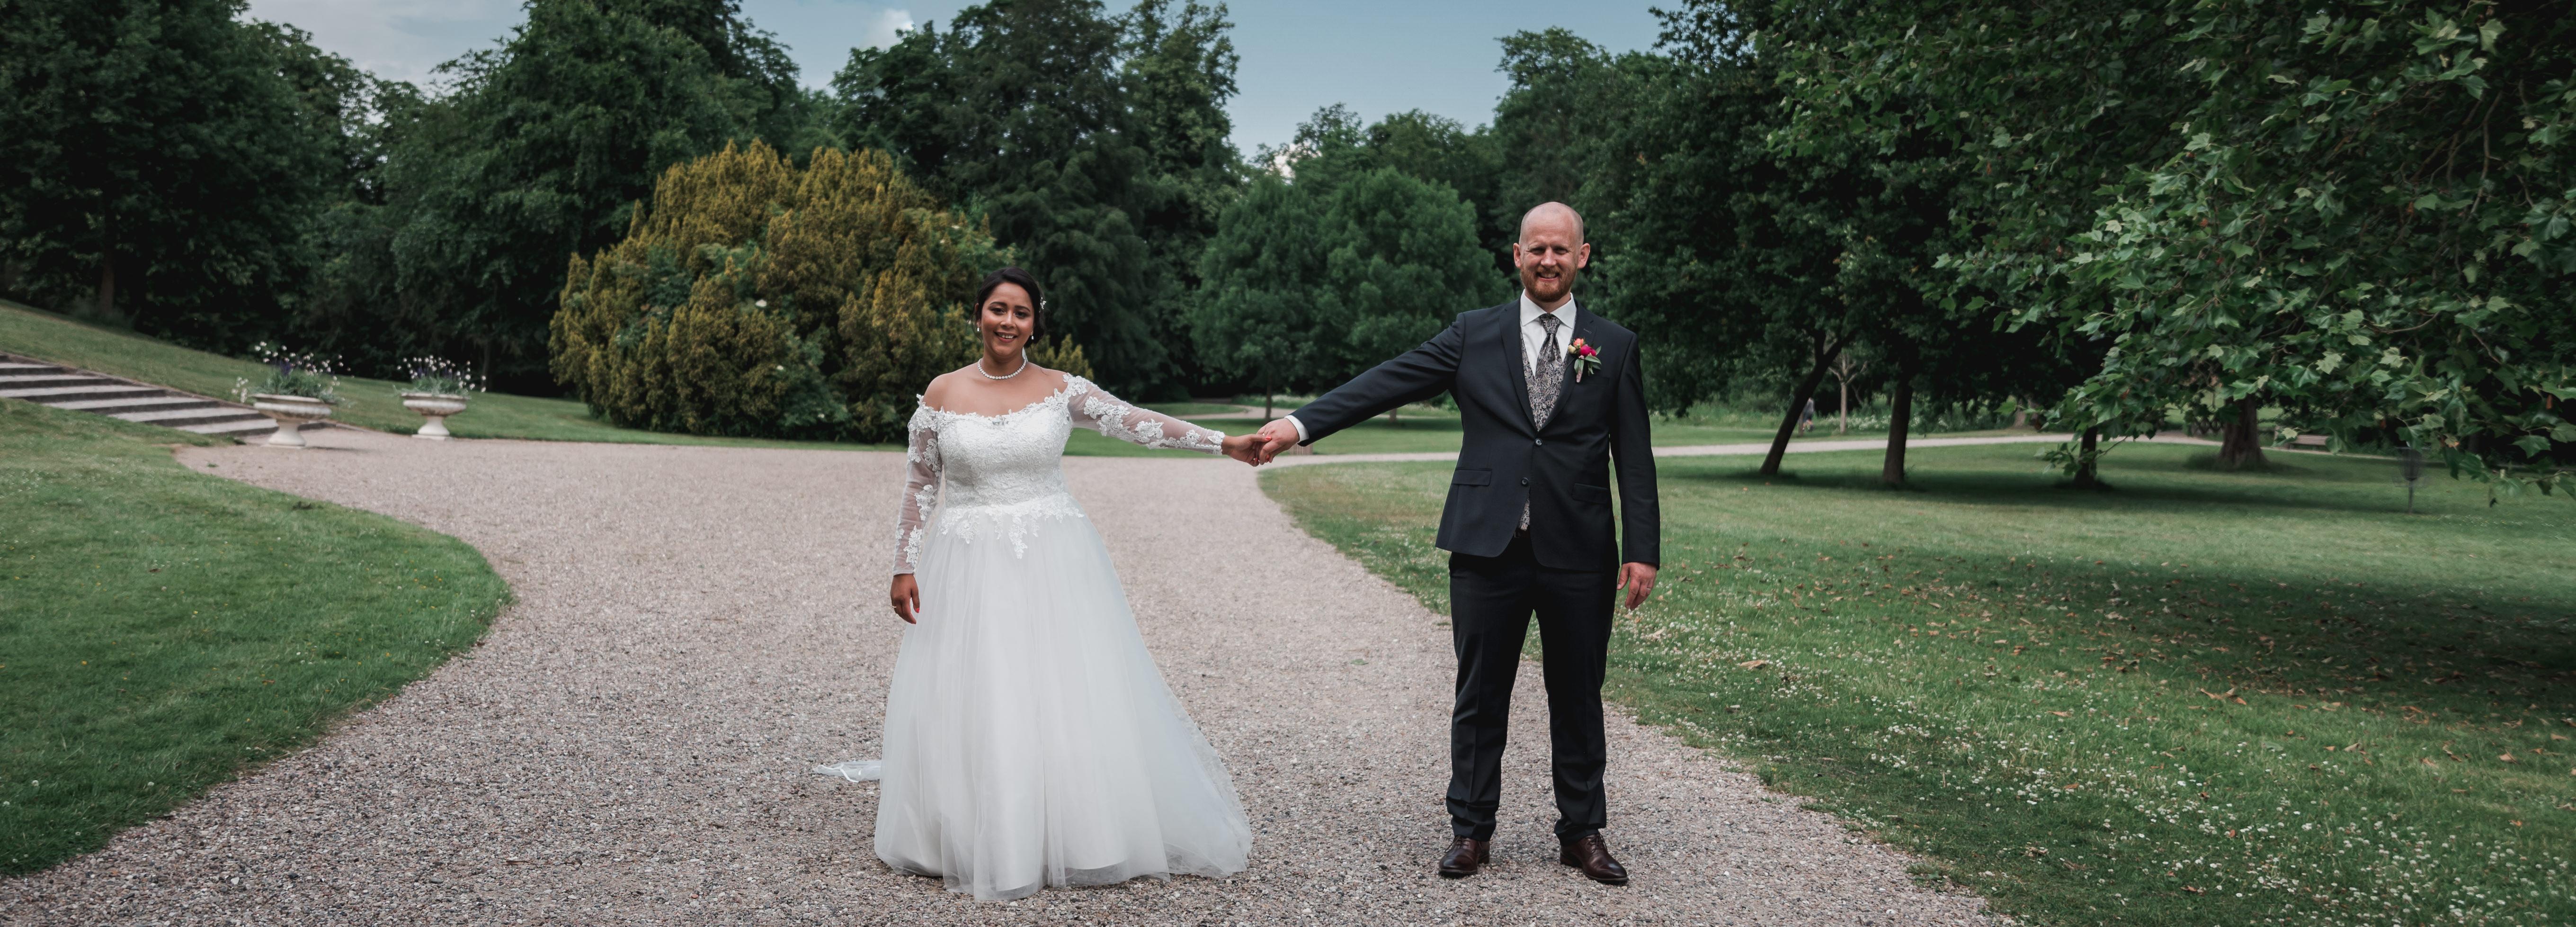 wedding_2020_042